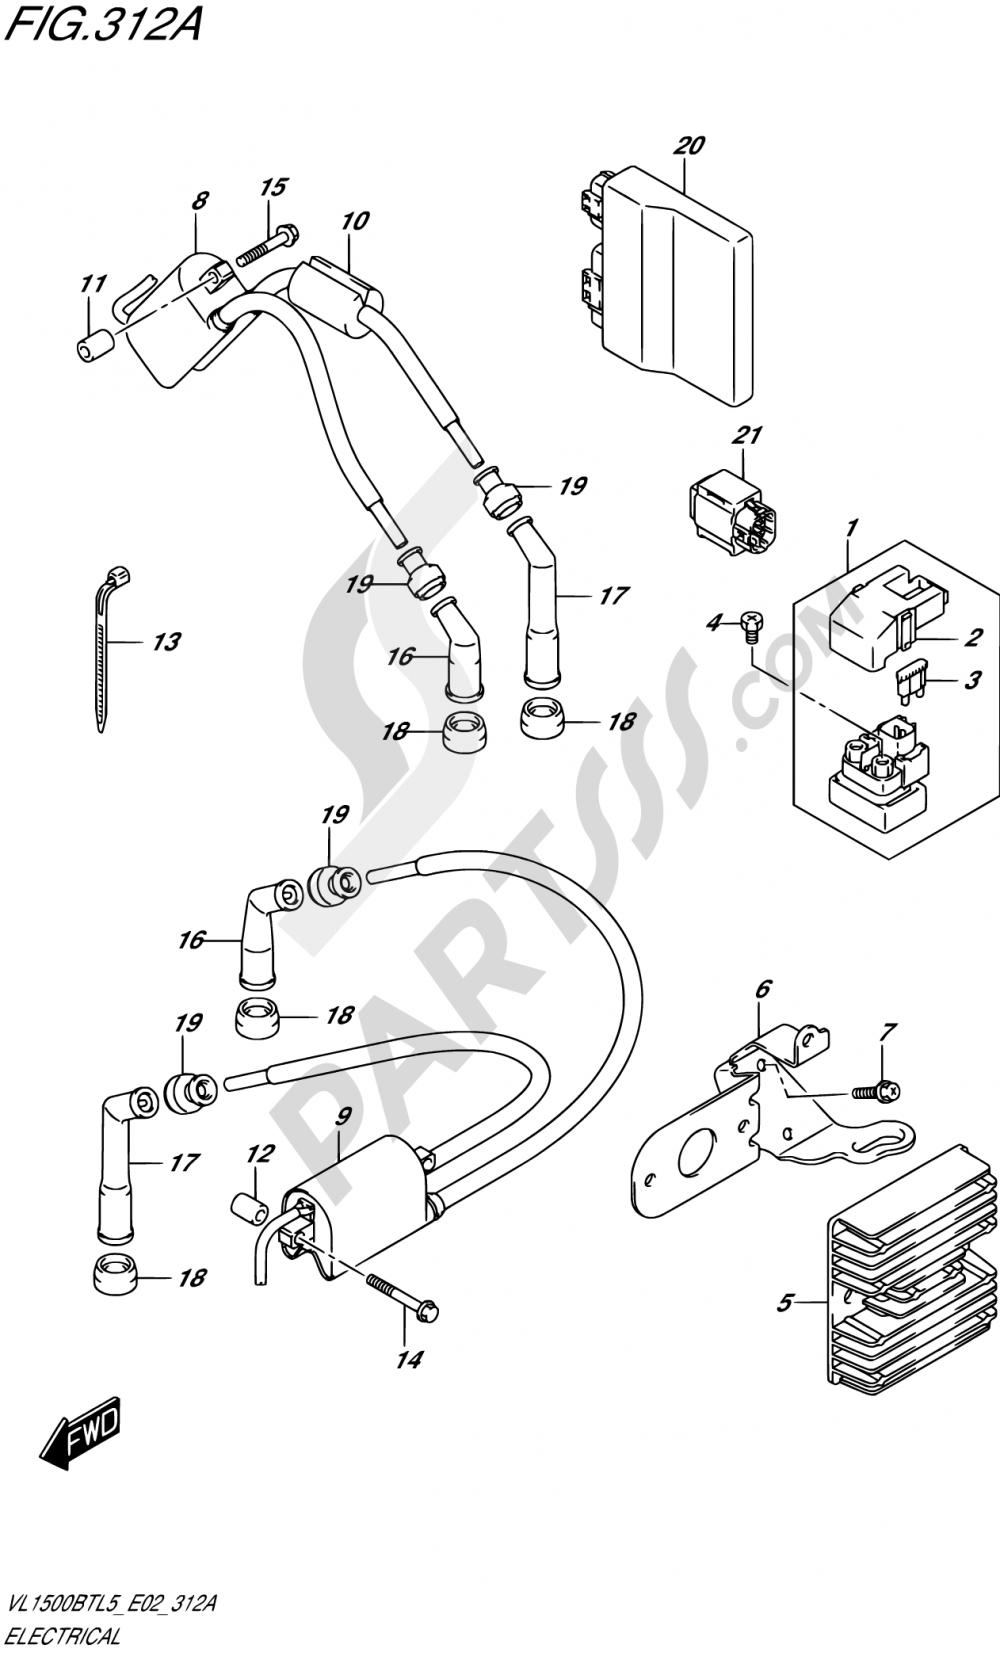 312A - ELECTRICAL Suzuki INTRUDER VL150 2015